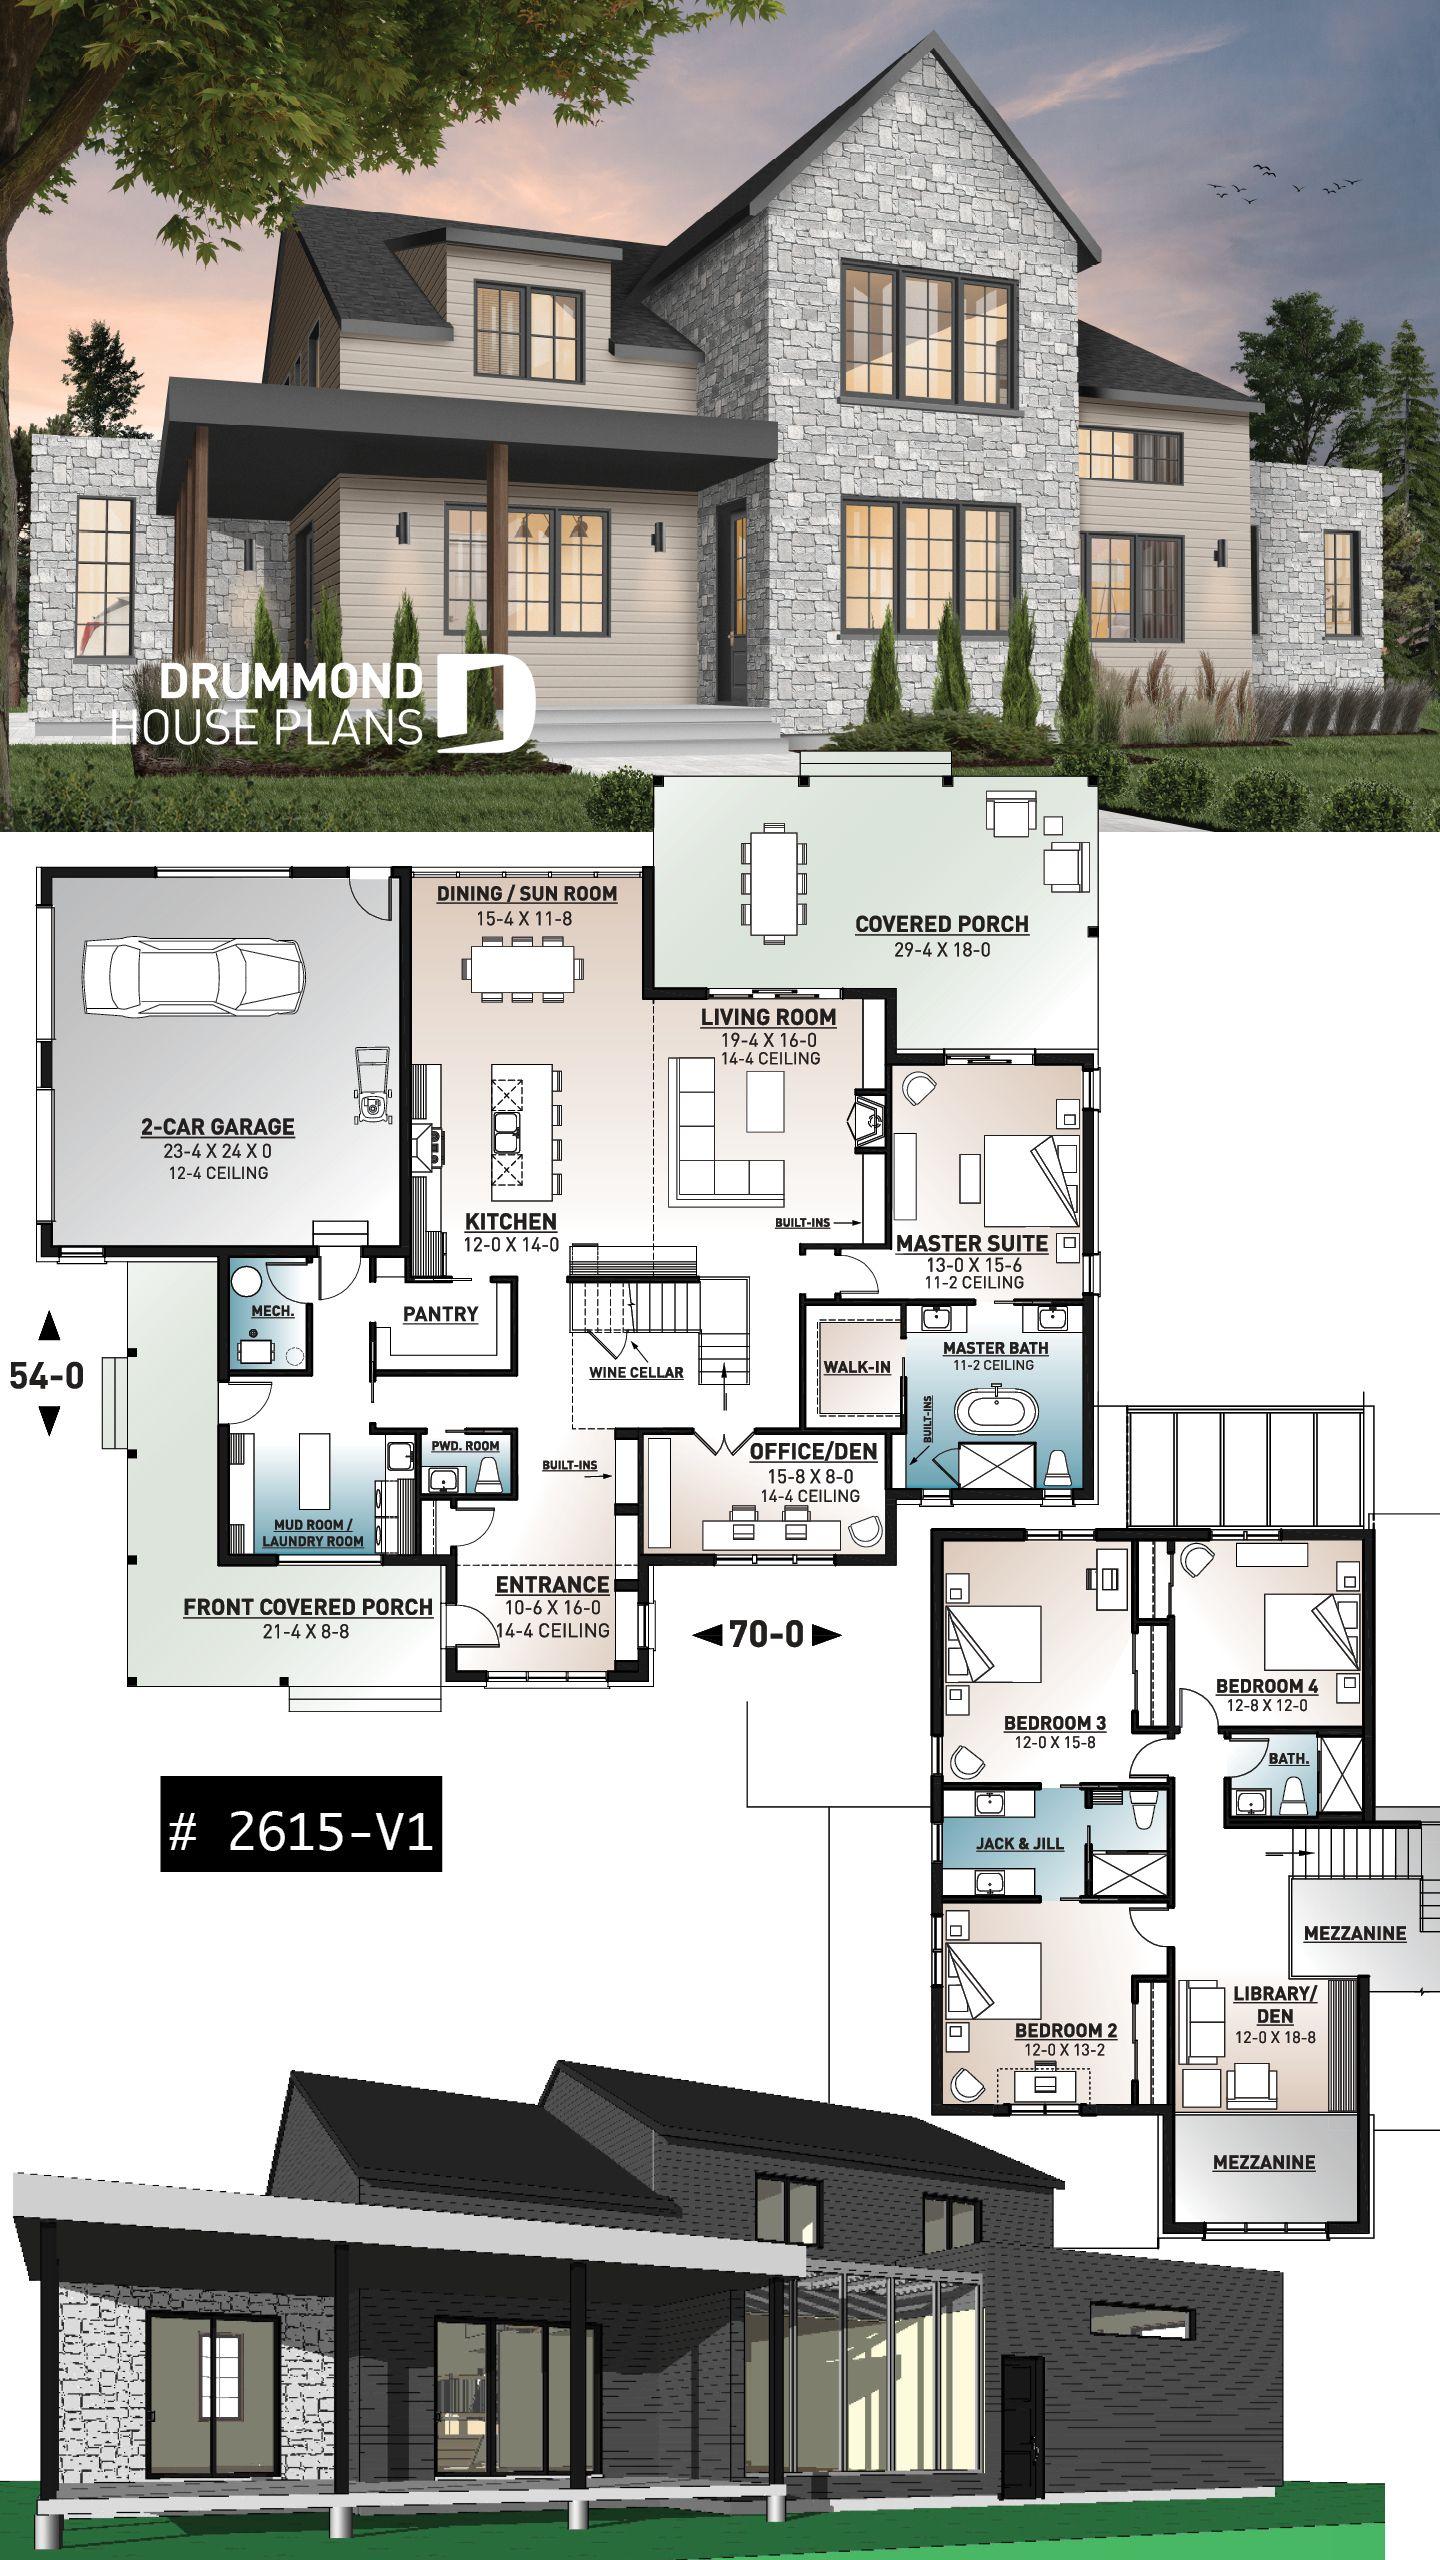 Modern farmhouse plan, 4 bedrooms, 3.5 baths, master suite